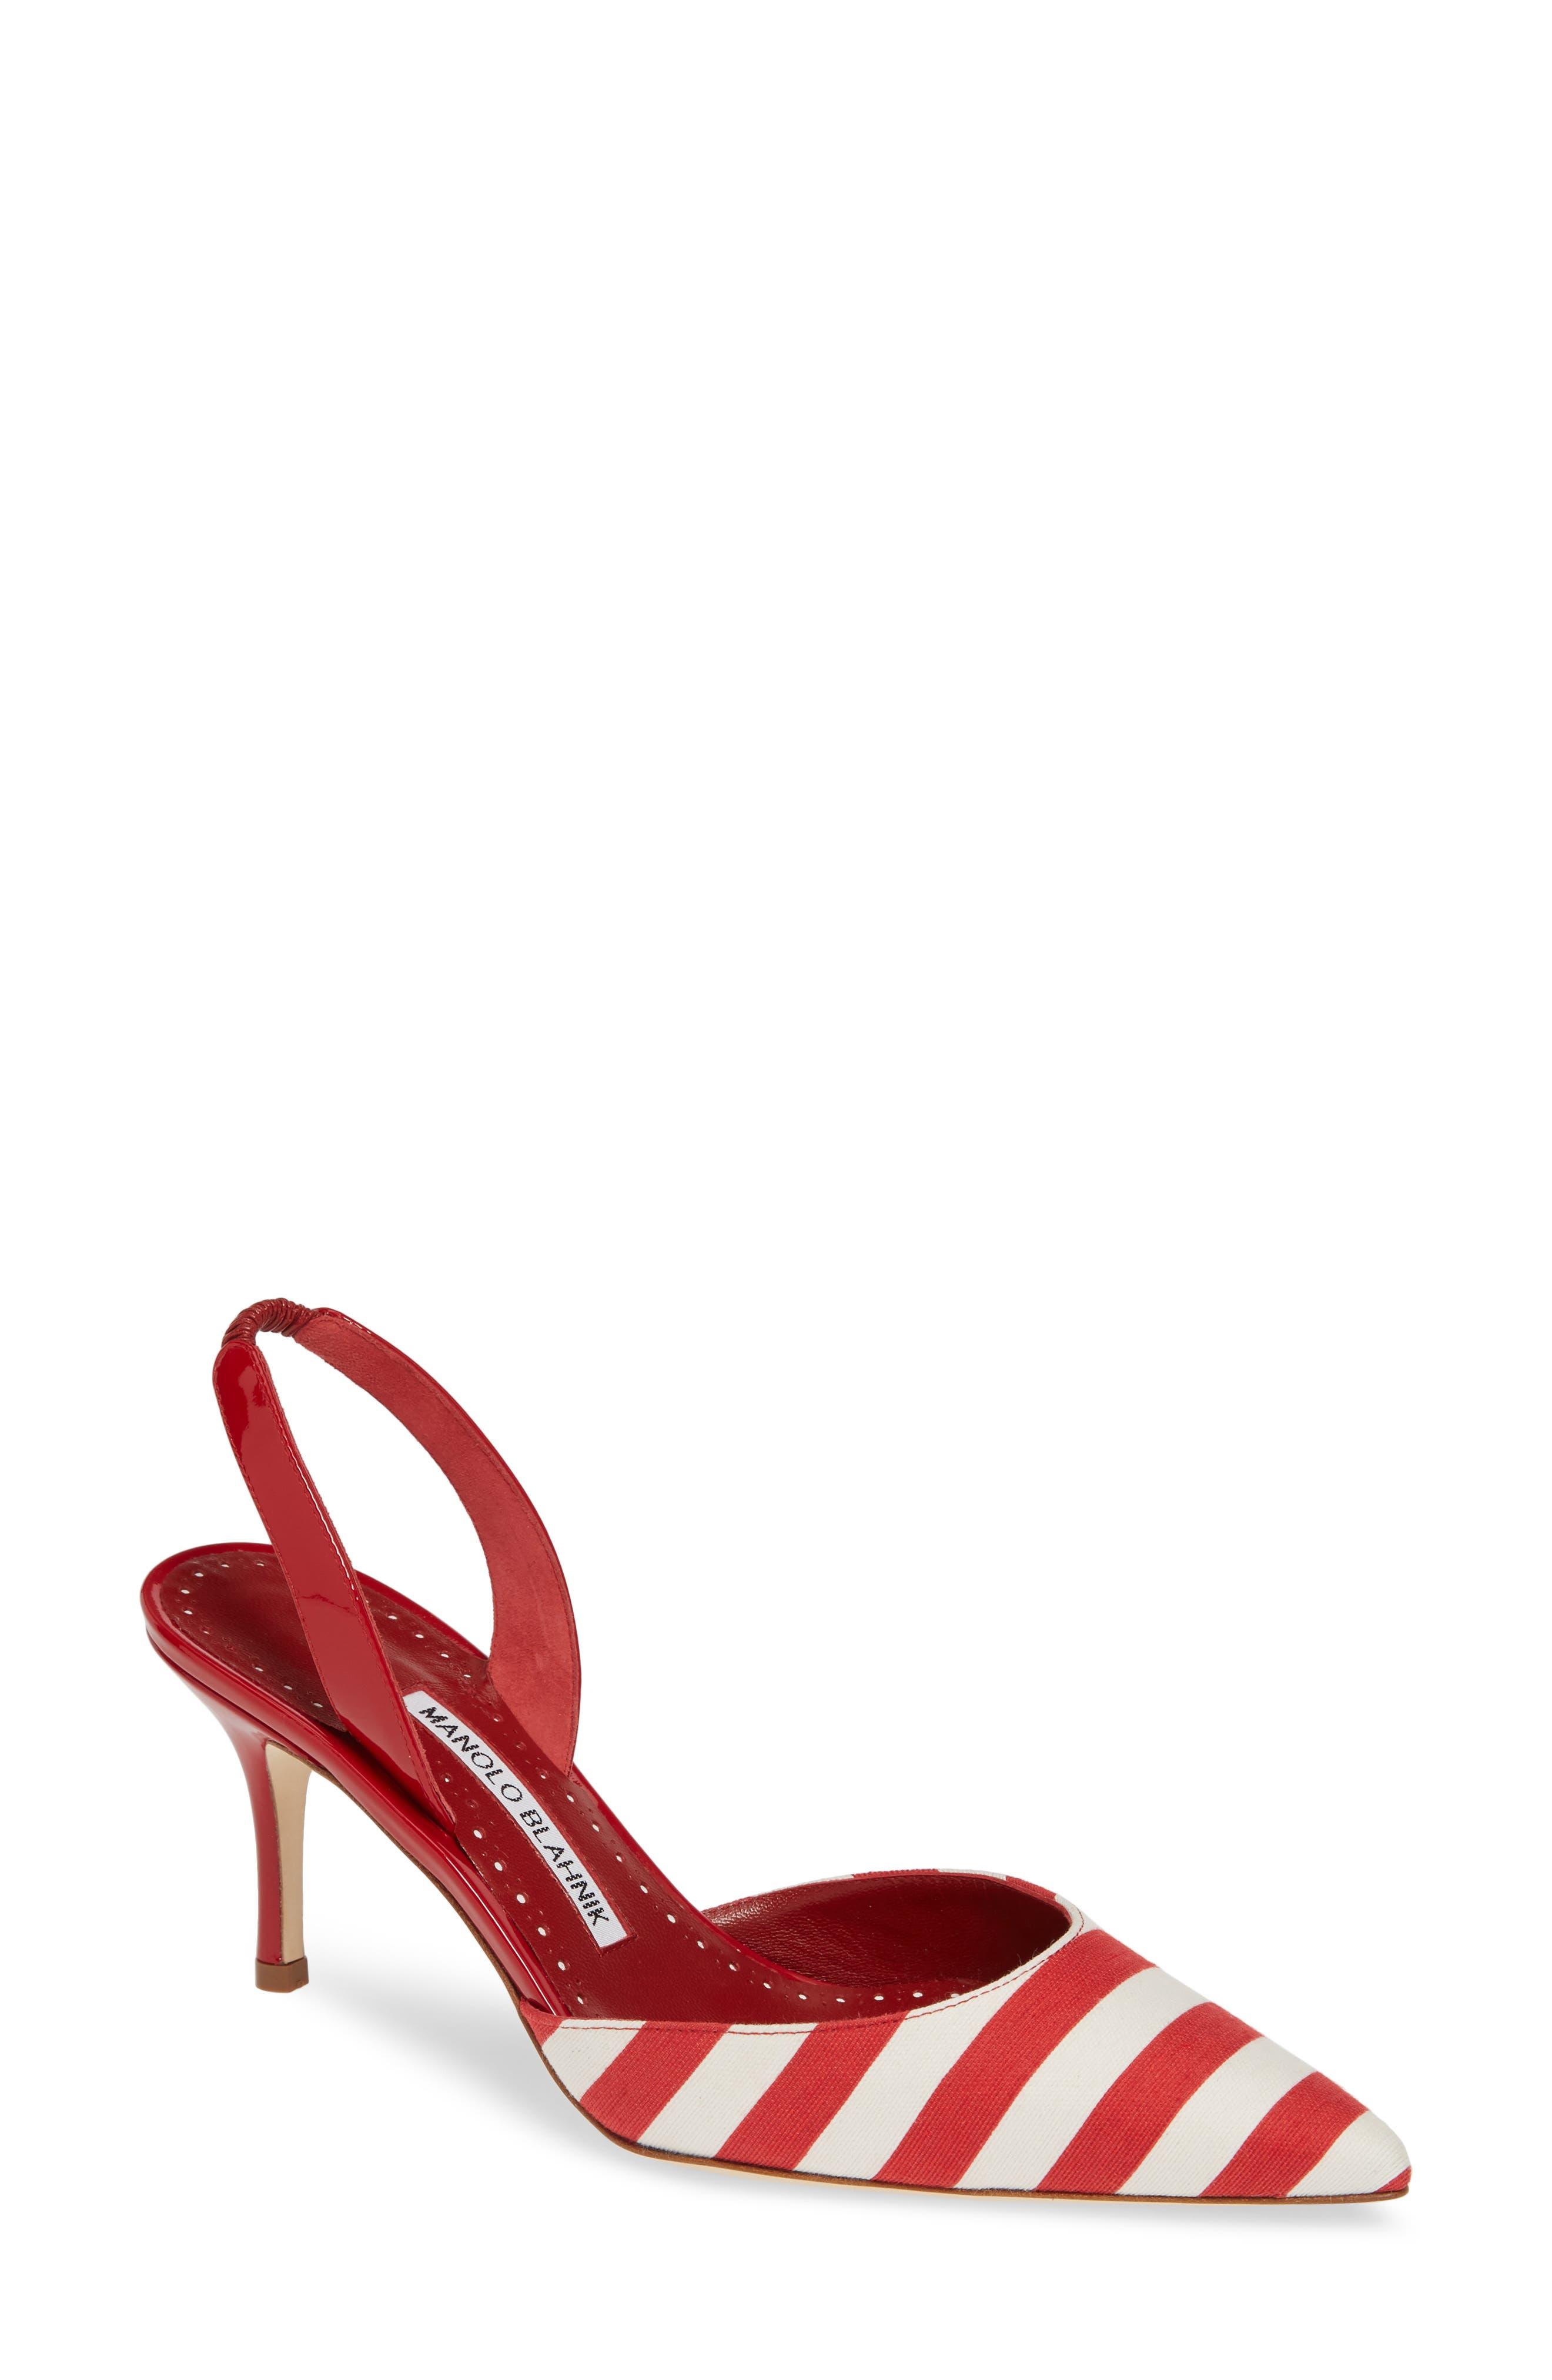 'Carolyne' Pointy Toe Slingback Pump,                         Main,                         color, RED/ WHITE STRIPE